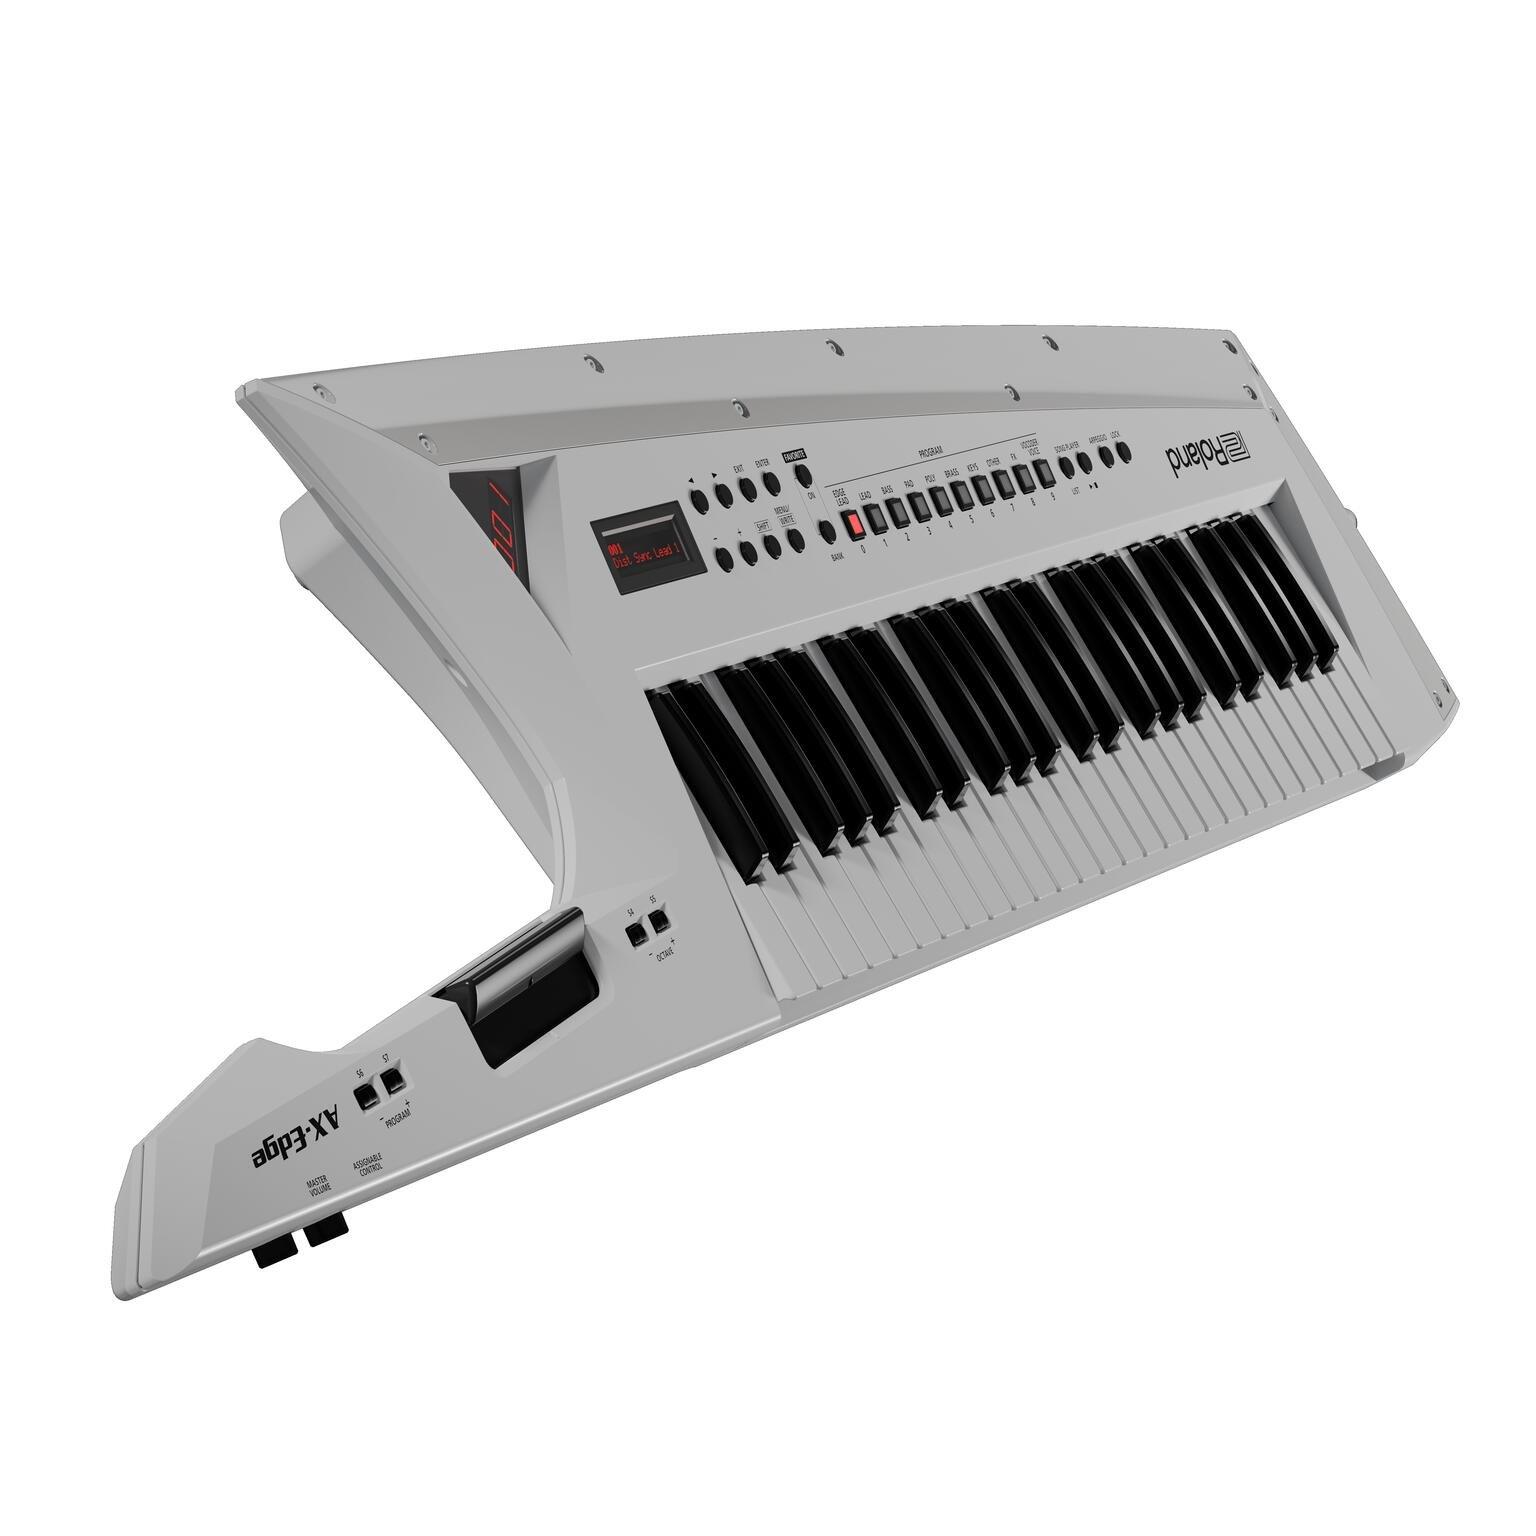 Roland AX-EDGE Keytar With Swappable Edge Blades   Full